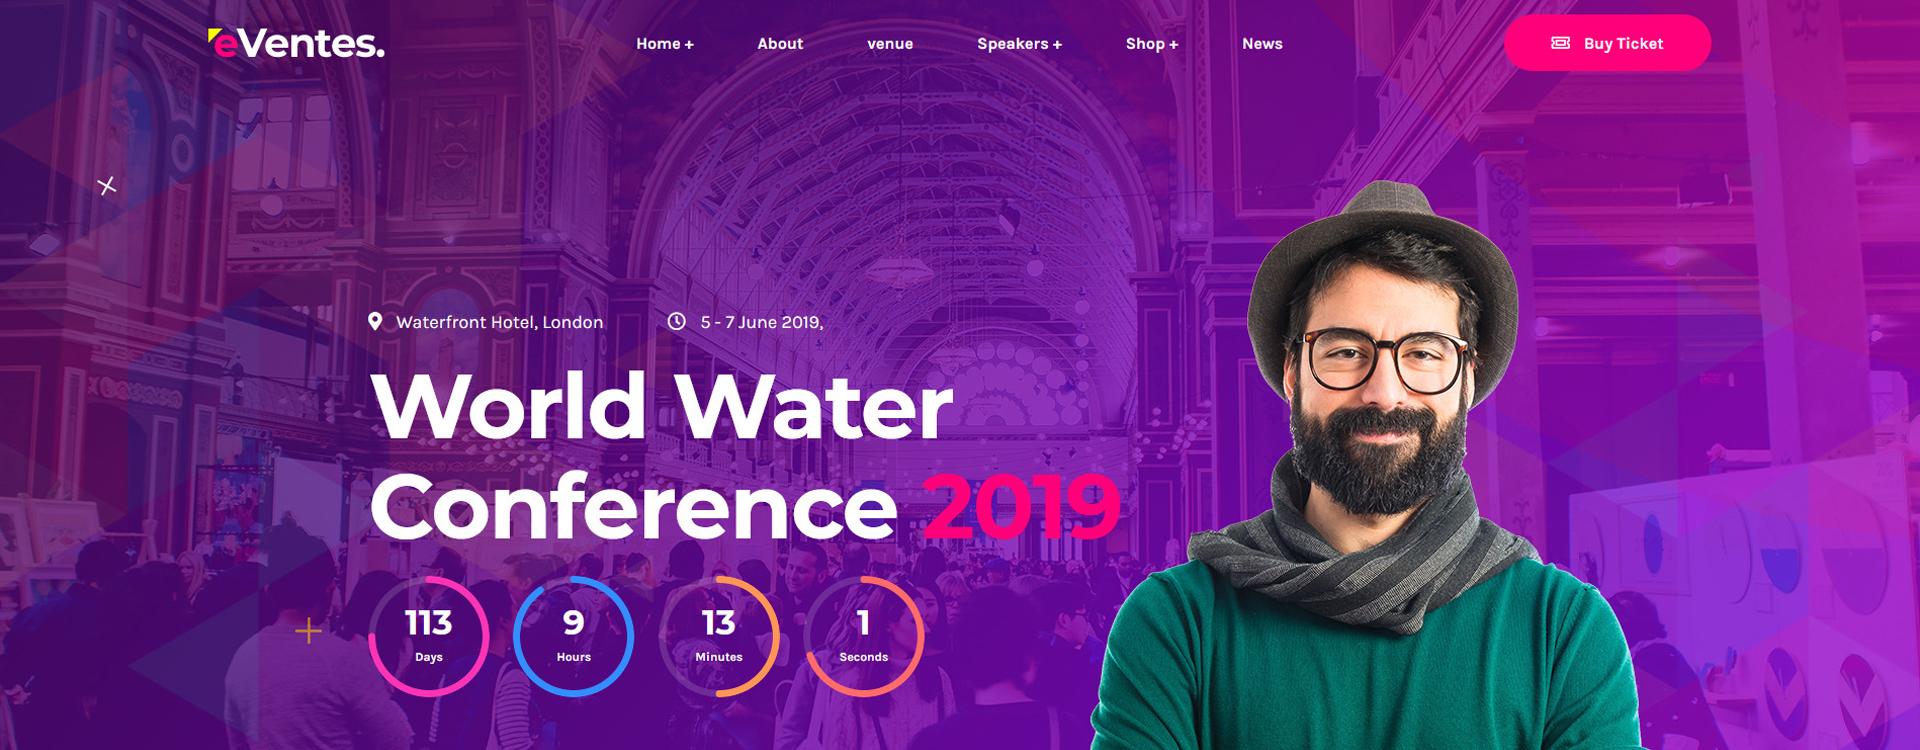 """Eventes - Conference and Event"" - адаптивний WordPress шаблон №88510"